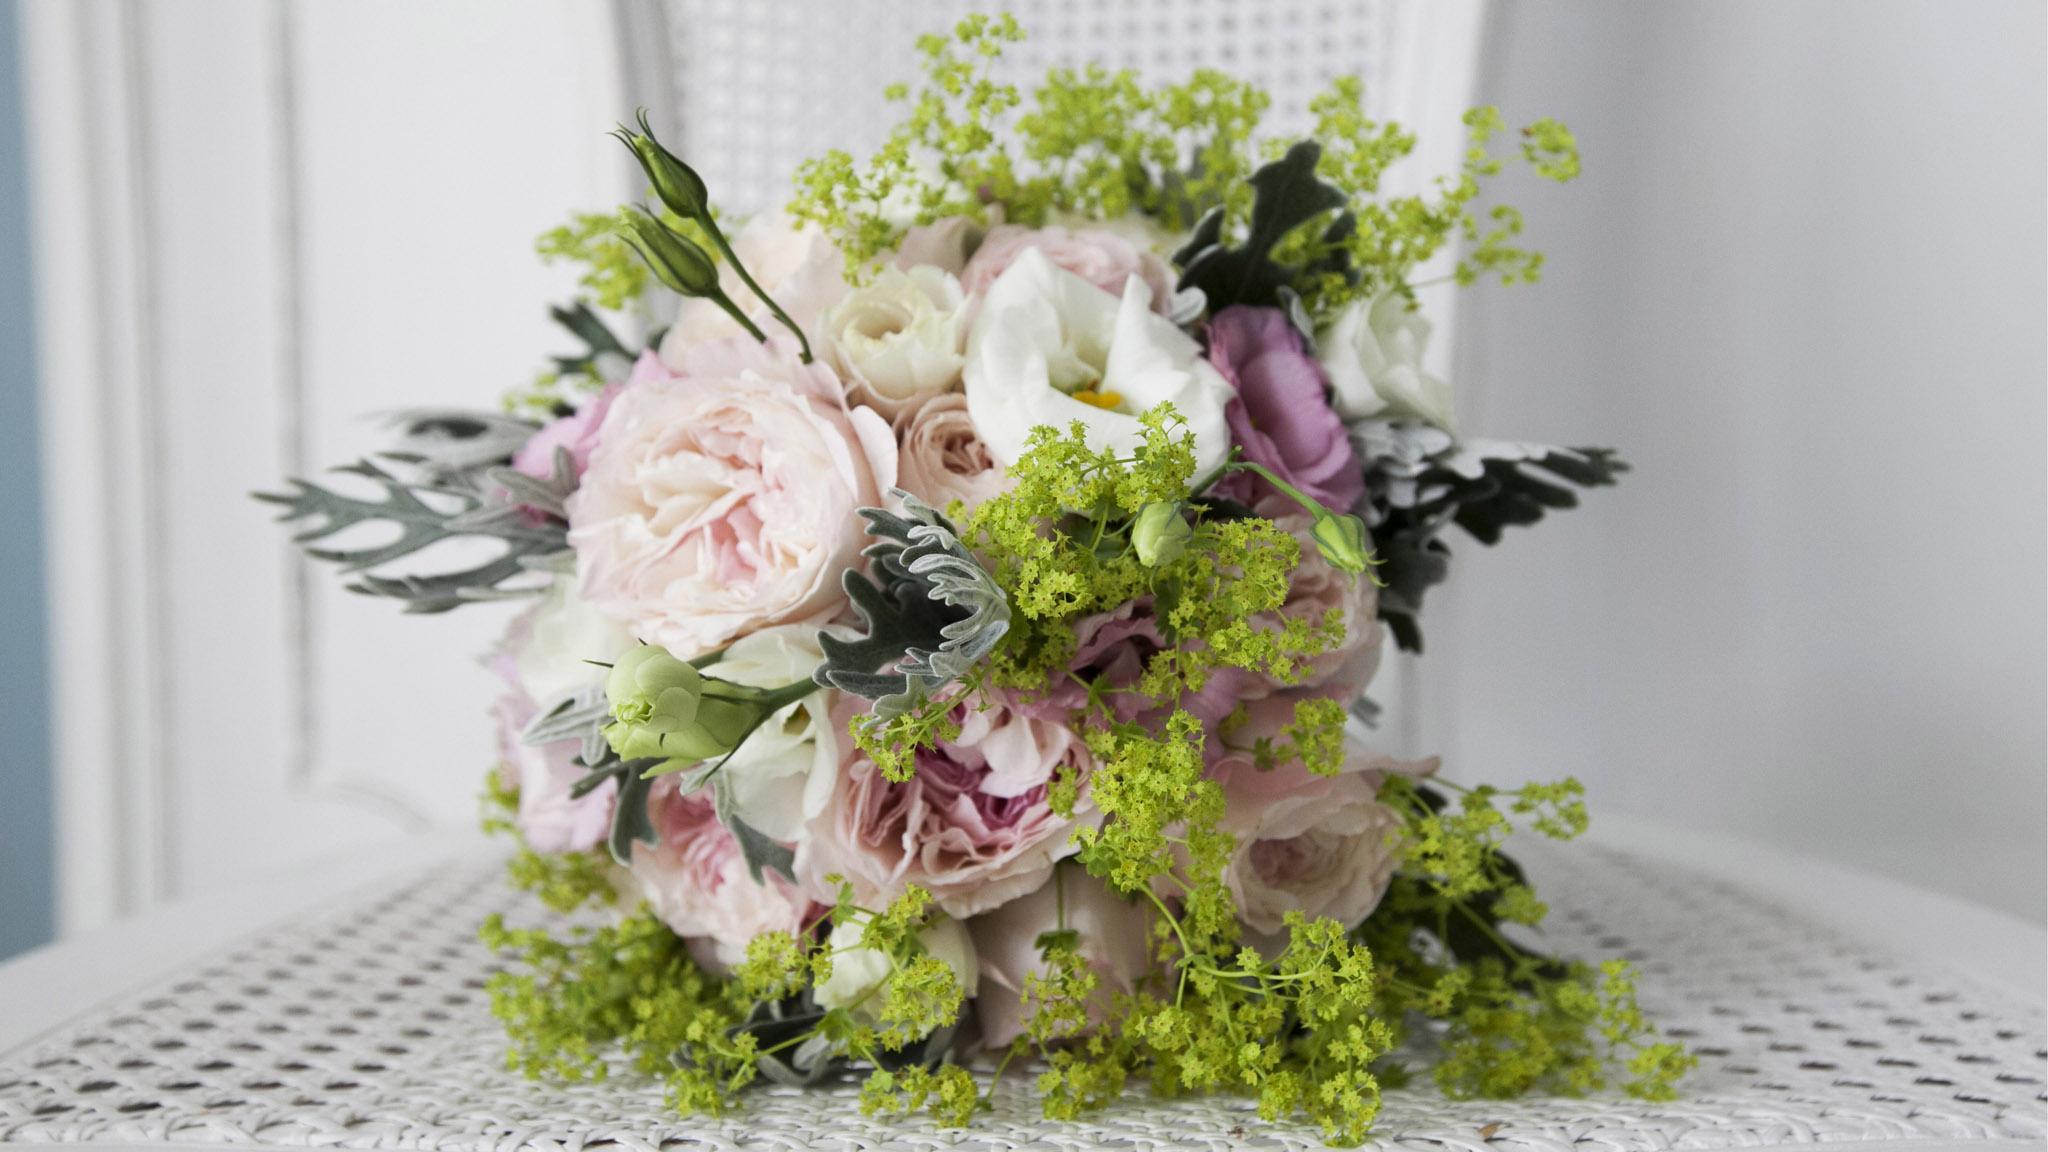 Matrimonio Country Chic Lago Di Garda : Matrimonio lago di garda women in wedding